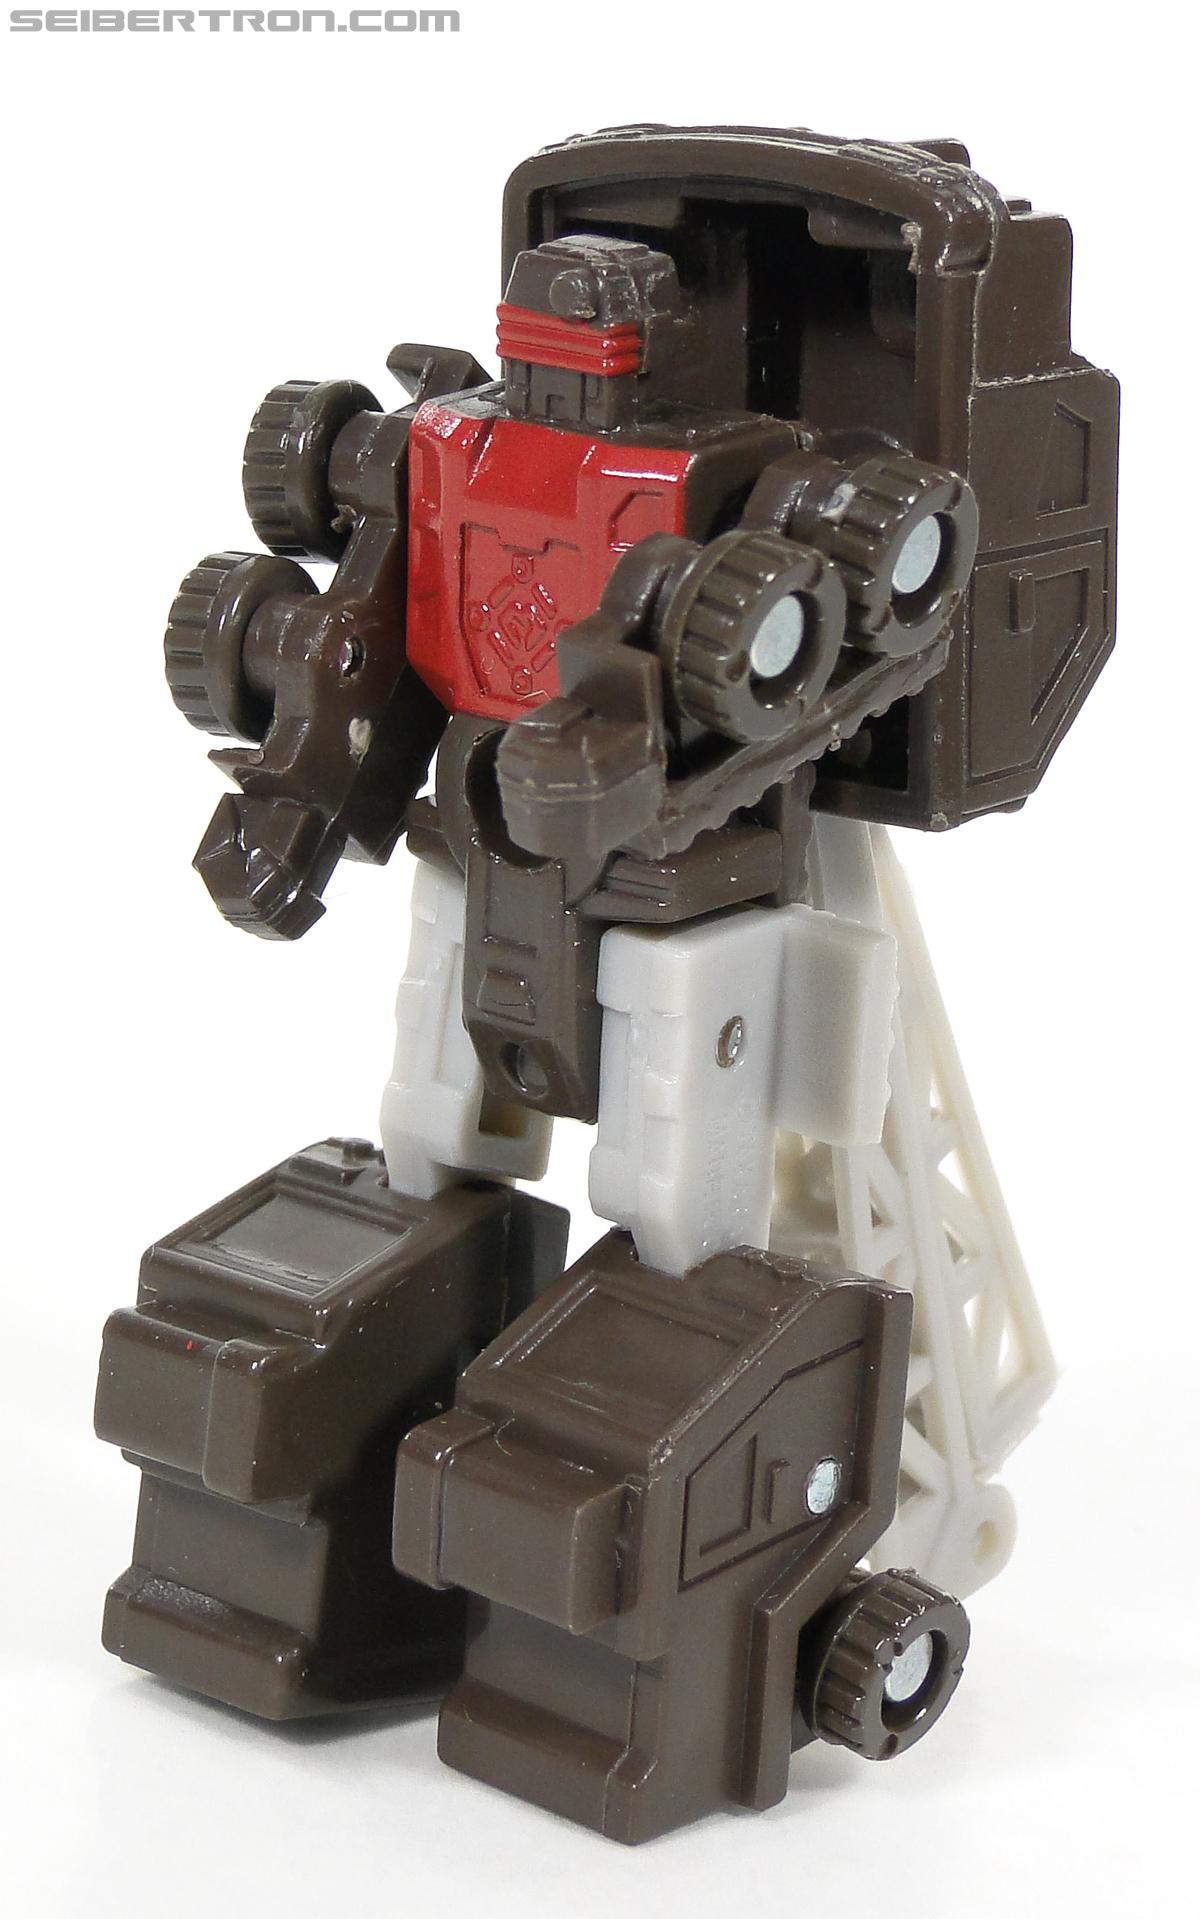 Transformers (2007) Longarm (Image #71 of 84)